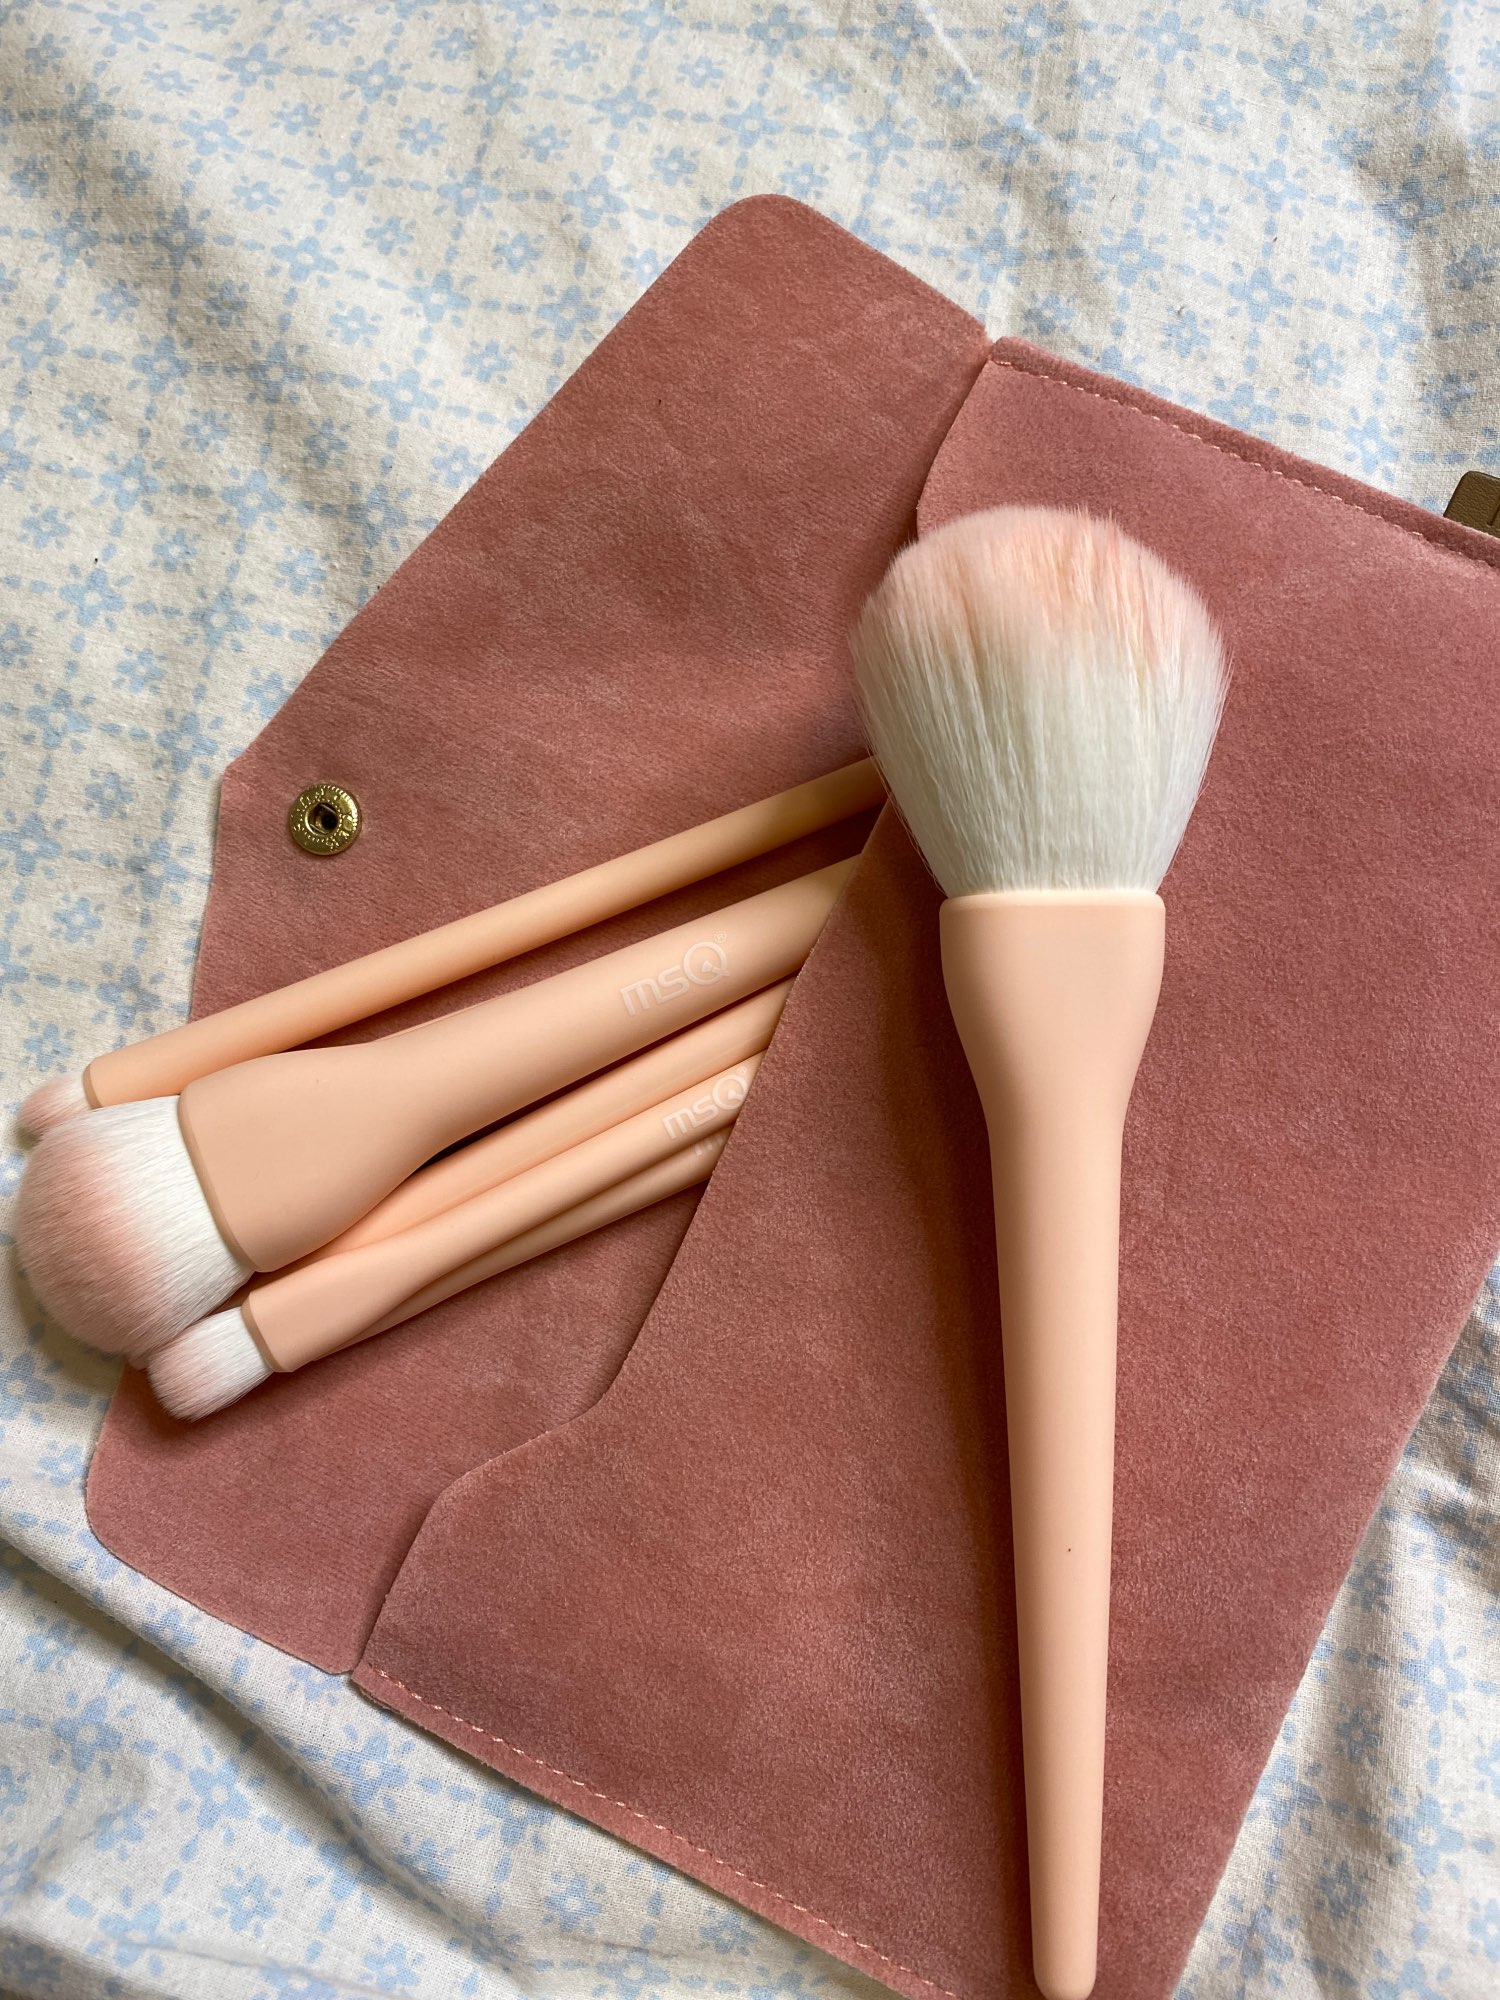 8PCS Makeup Brushes Sets Powder Foundation Blusher Eyeshadow Brush Candy Cosmetic Colorful Make Up NO MSQ LOGO With Bag reviews №2 223978